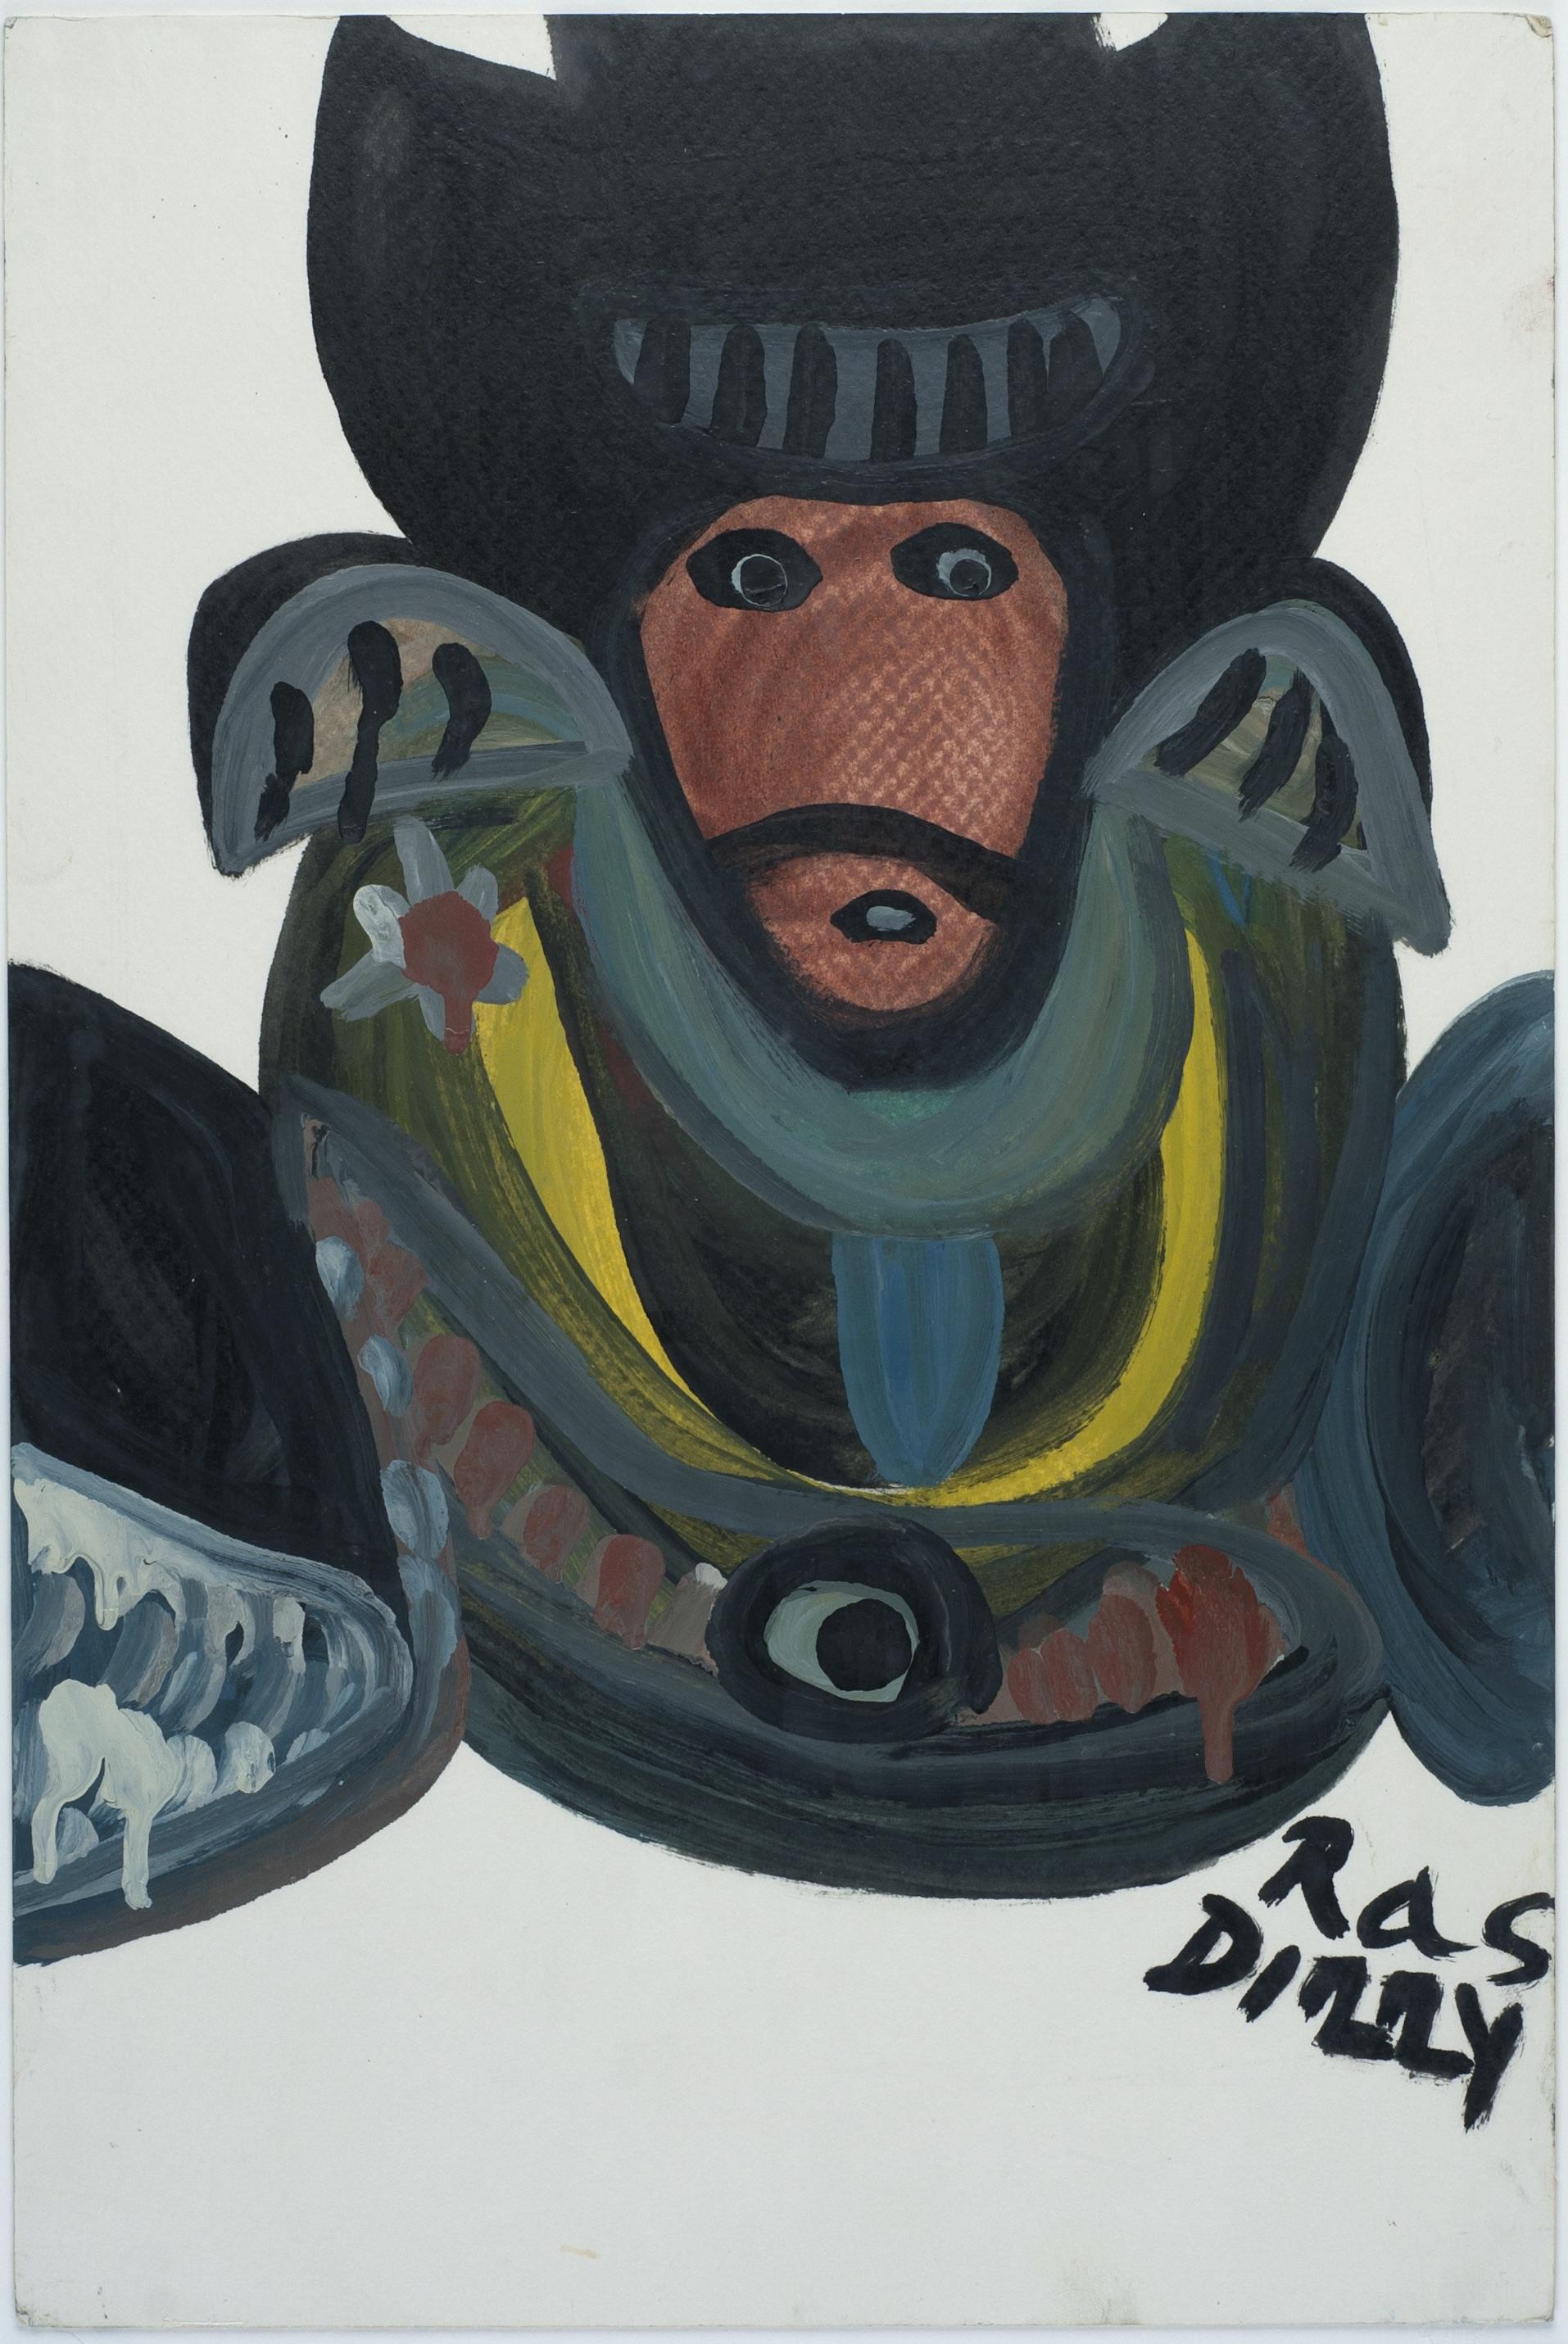 Ras Dizzy When Marshall John Reaches Star 17..., 1998 Oil, tempera on matboard 17.75 x 11.75 inches 45.1 x 29.8 cm RD 103